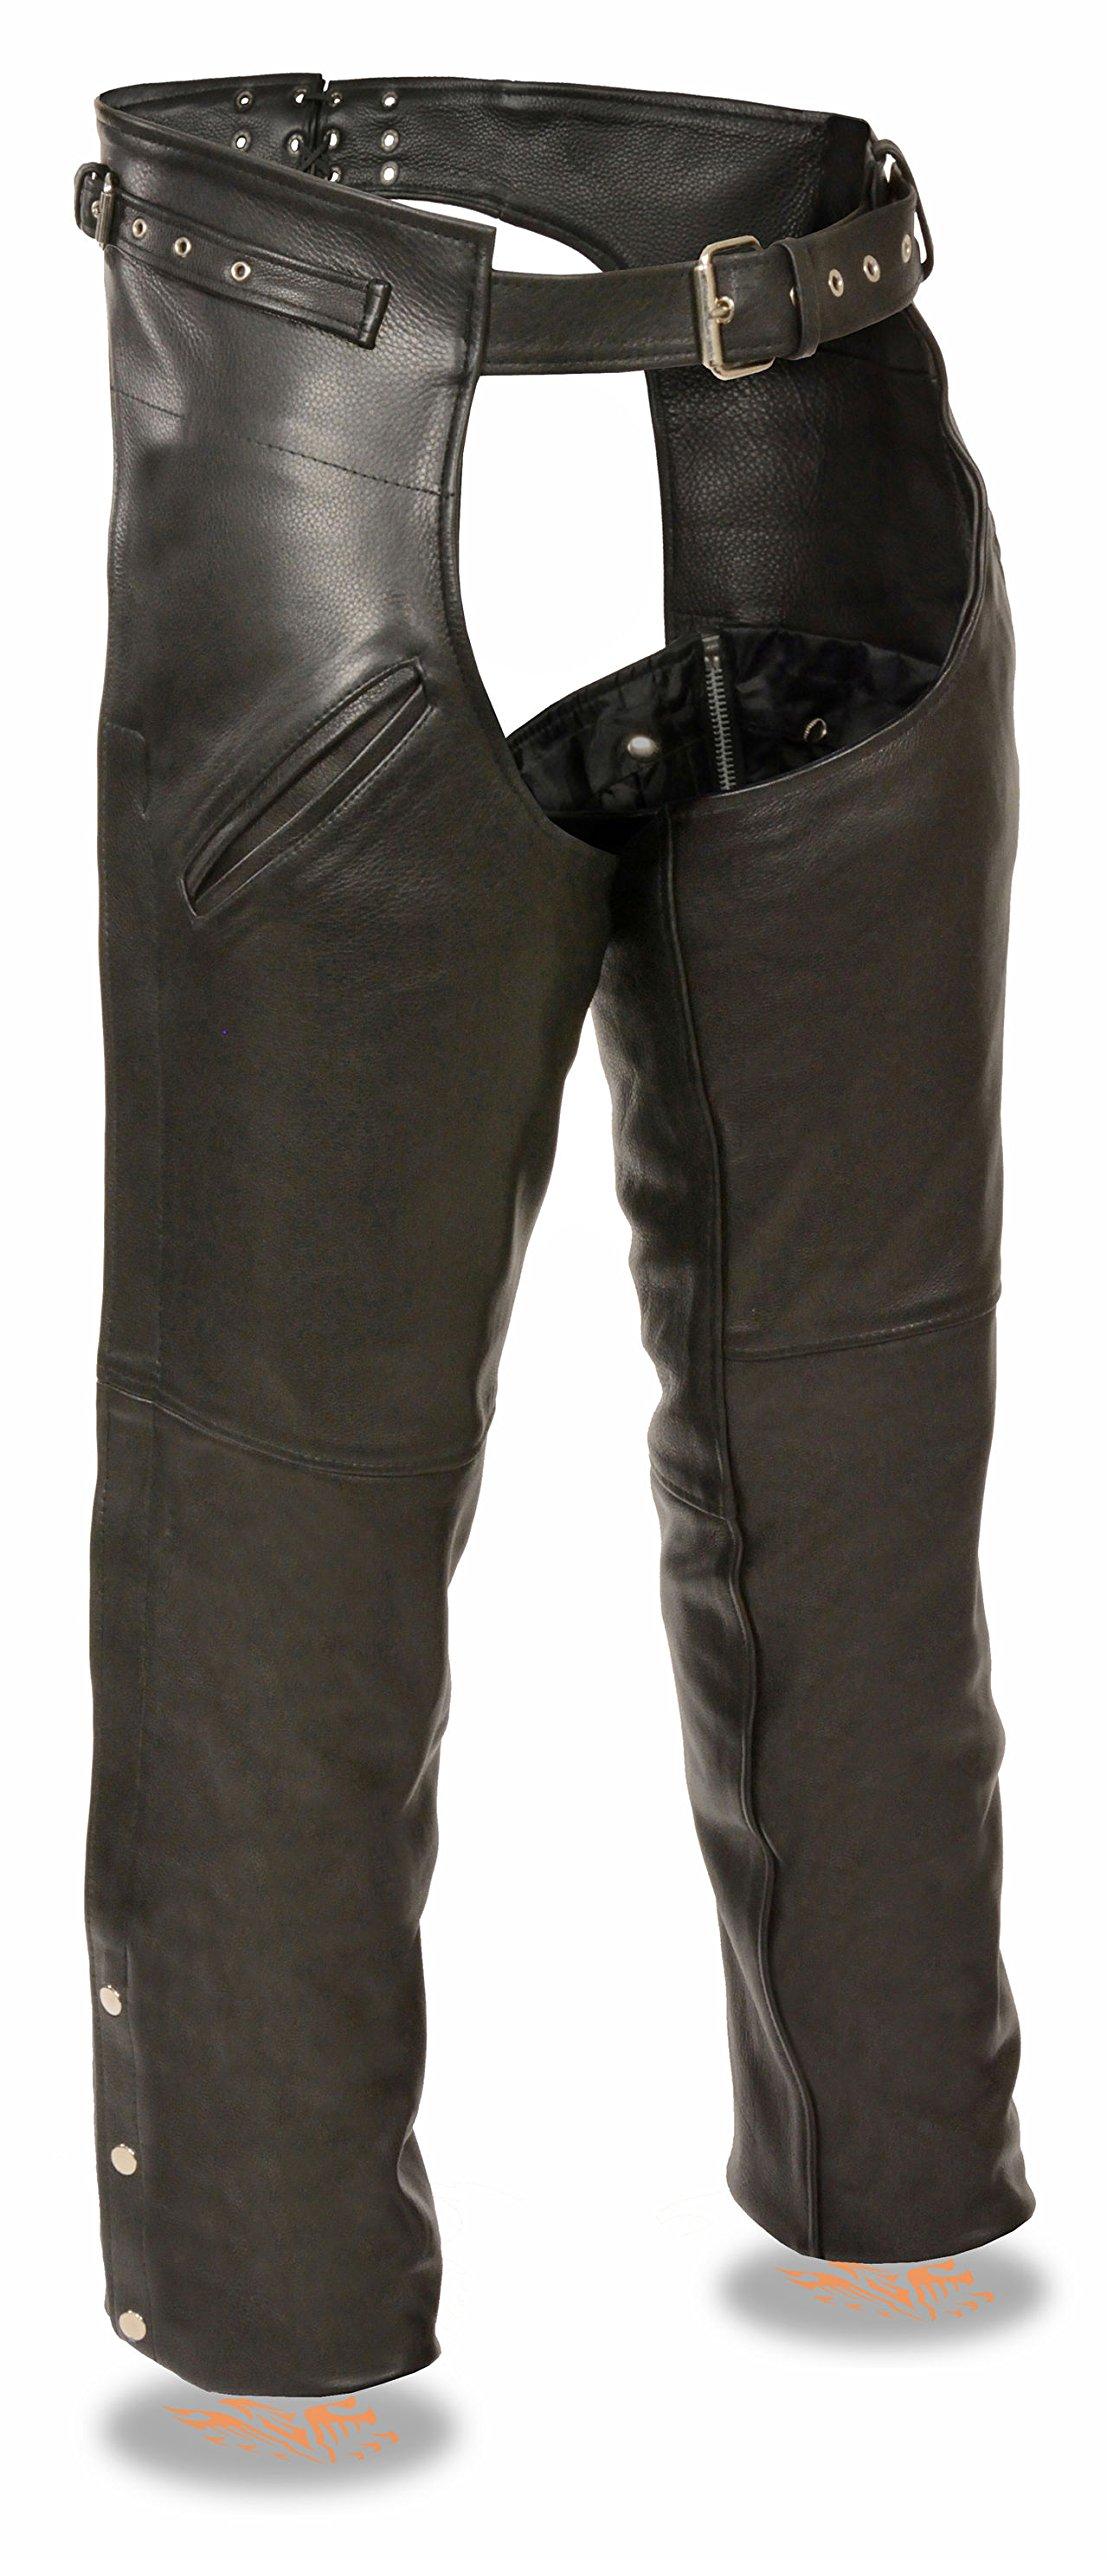 Milwaukee Leather Men's Gun Holster Leather Chap w/ Thigh Pockets (Black, 5X)